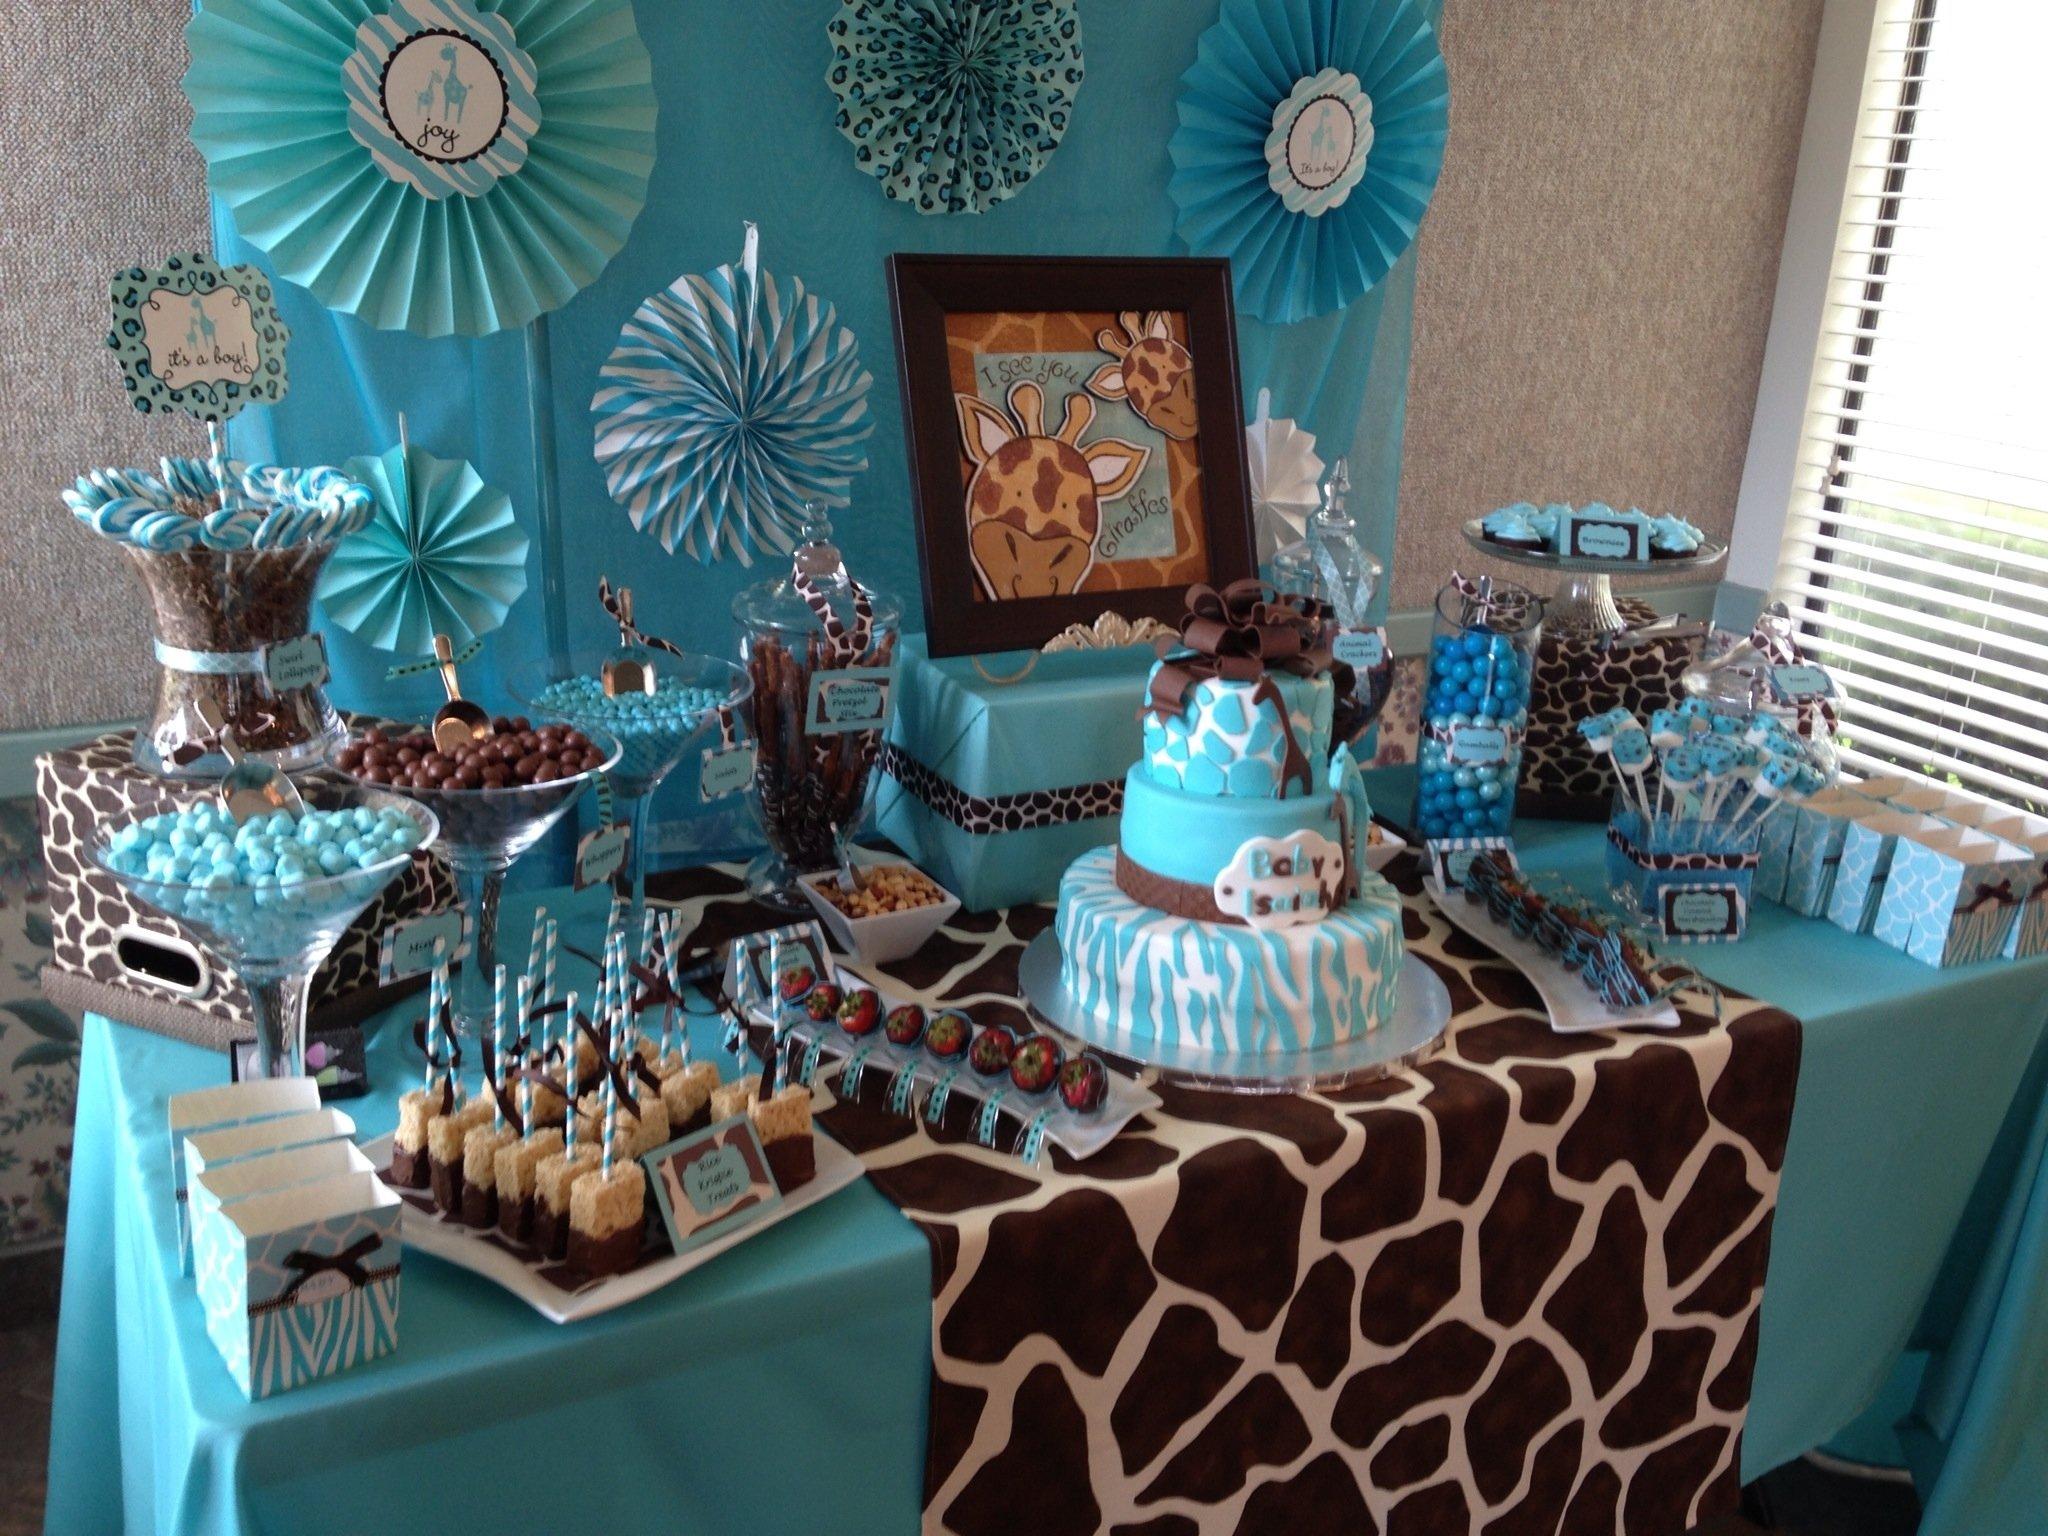 10 Fashionable Blue Safari Baby Shower Ideas safari baby shower candy table baby shower ideas pinterest 3 2020